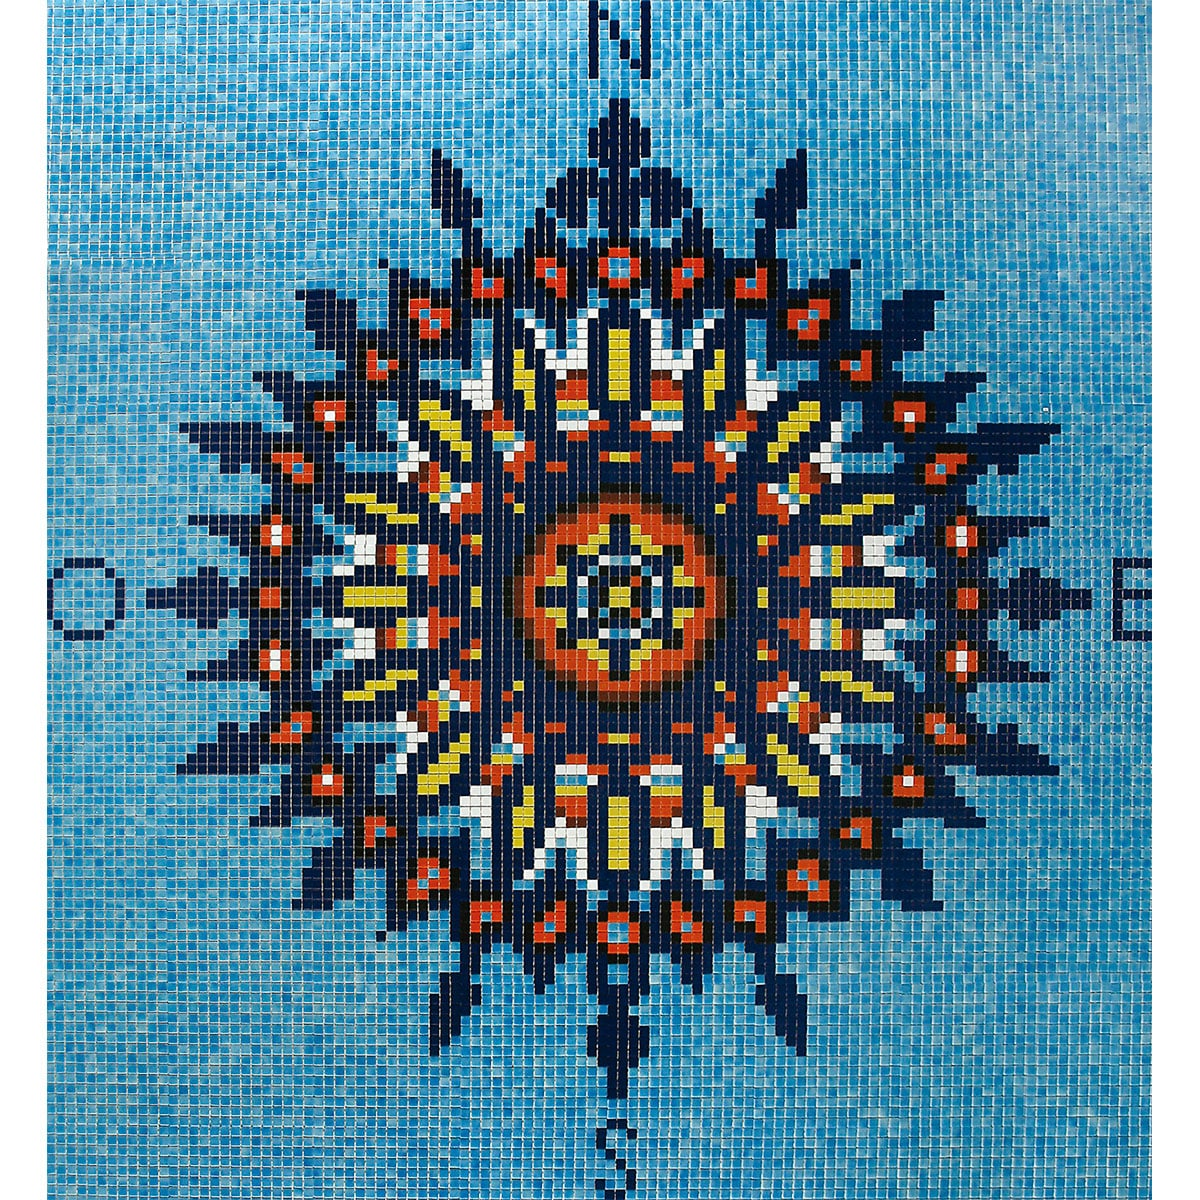 D-11-2,76-x-3,05-m-DIBUJOS-Mosaic-Ezarri.jpg